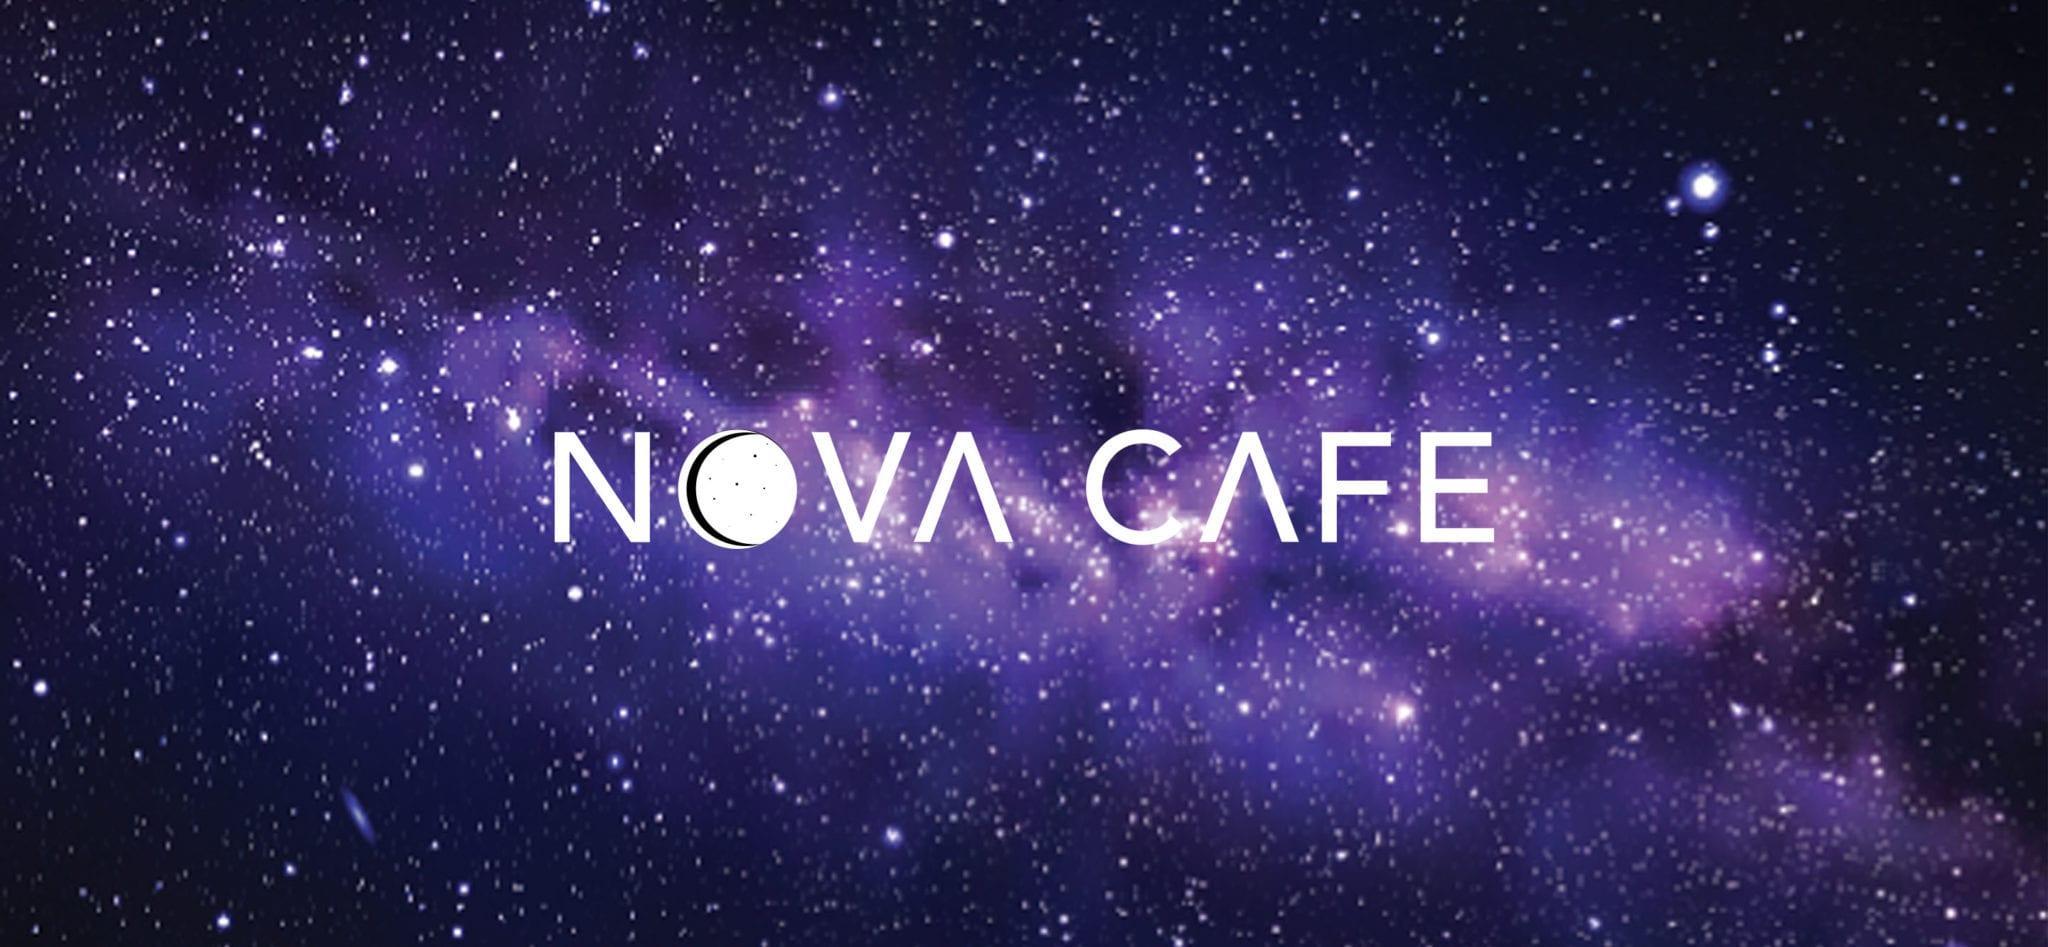 NOVA CAFE 2 BANNER copy